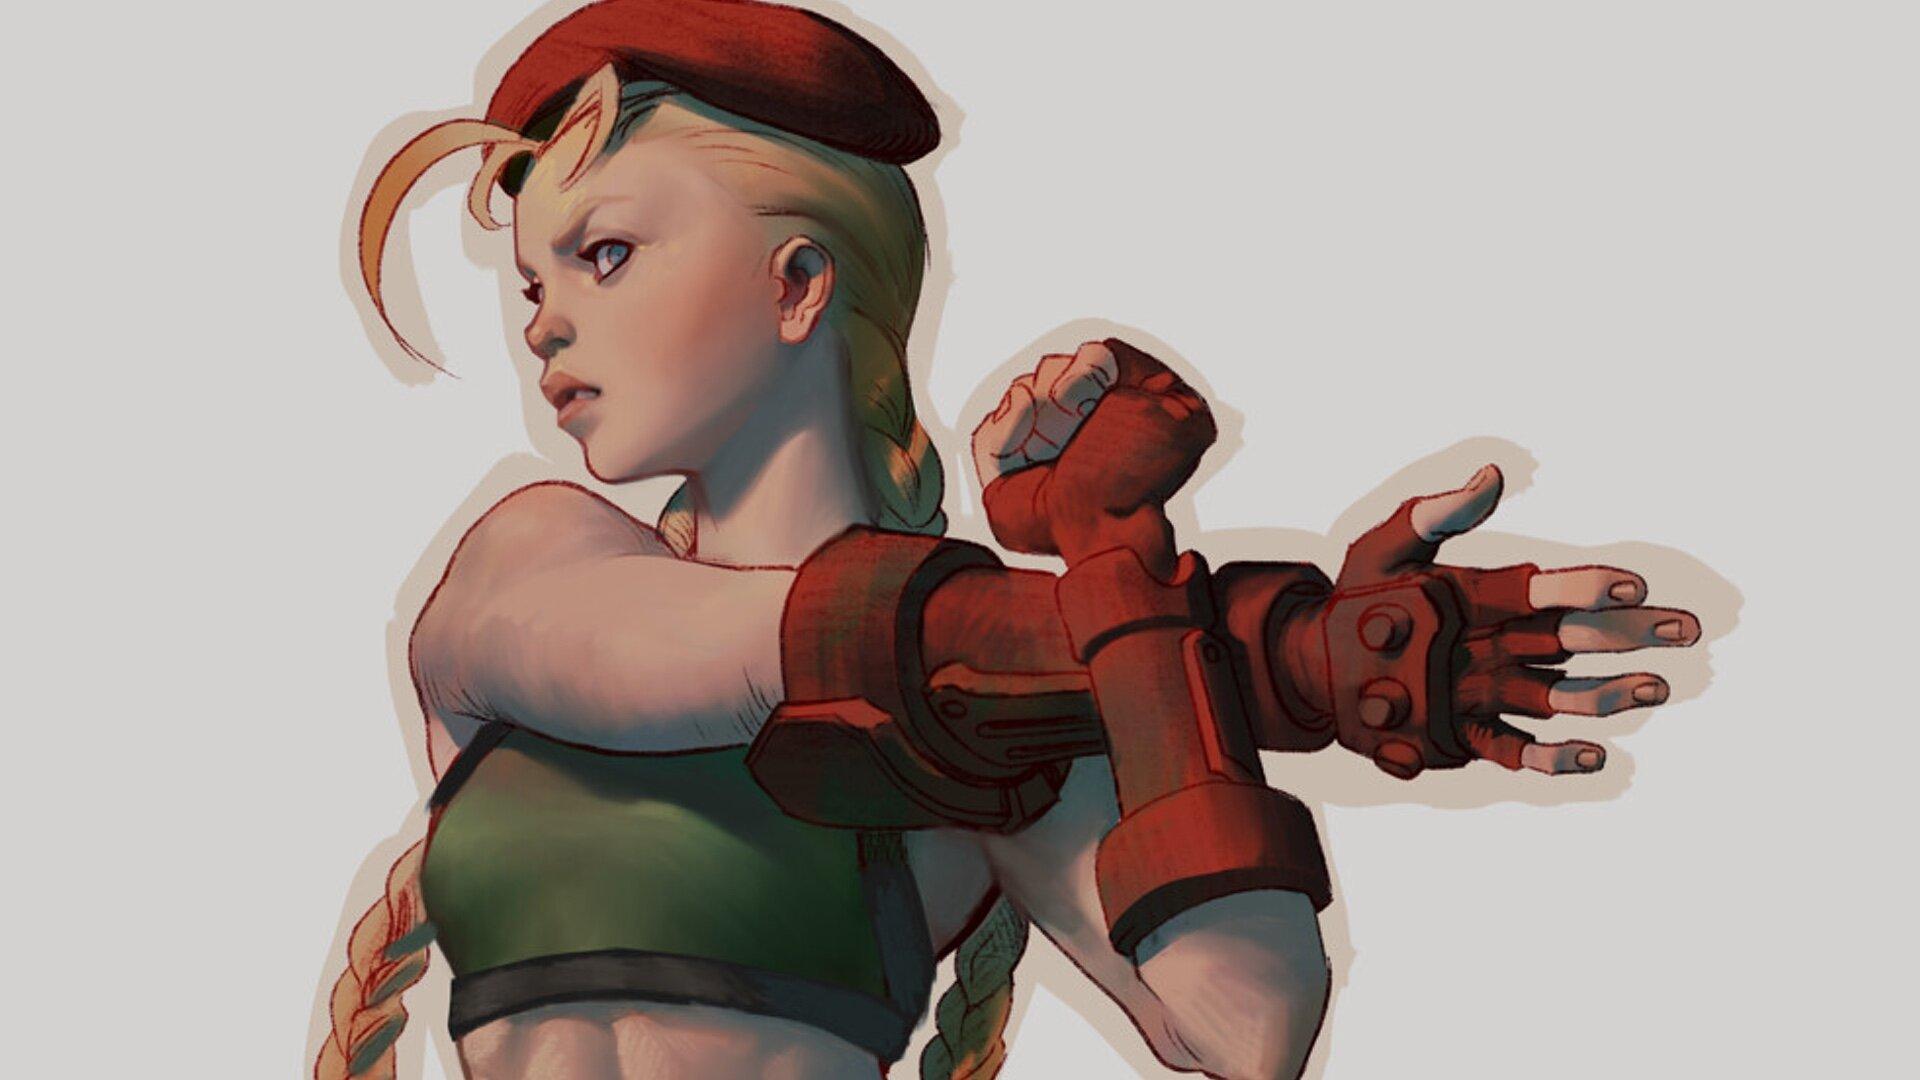 Street Fighter Fan Art Series Created By Senior Illustrator At